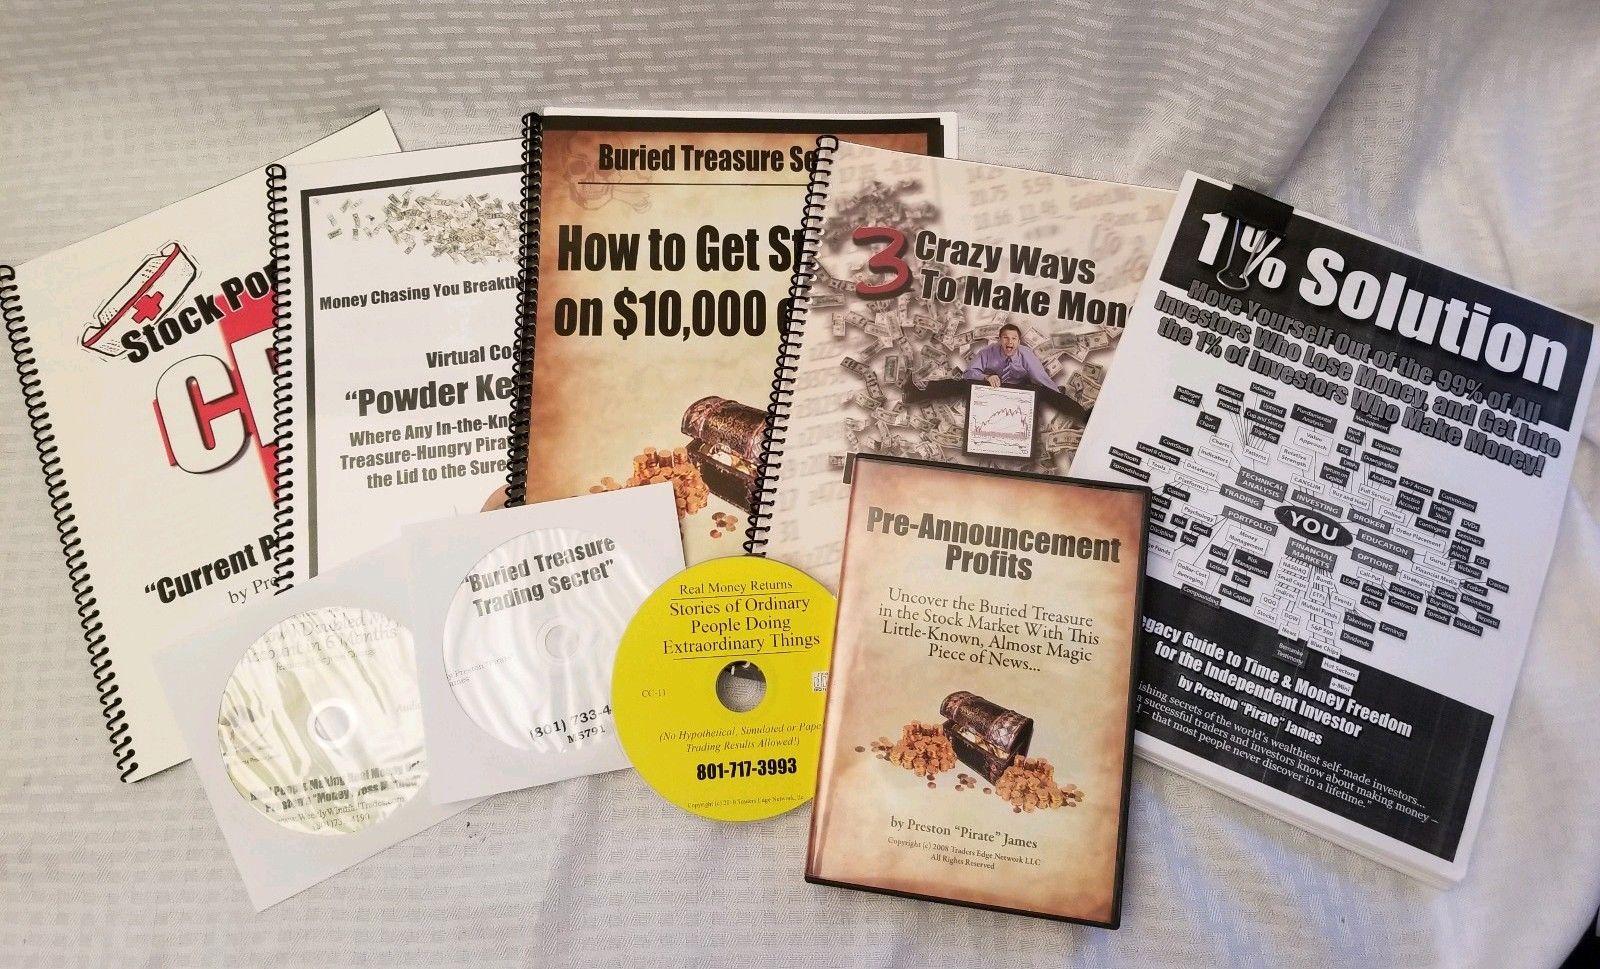 Preston James Pirate Reports trading stock market online academy nasdaq DVD CDs